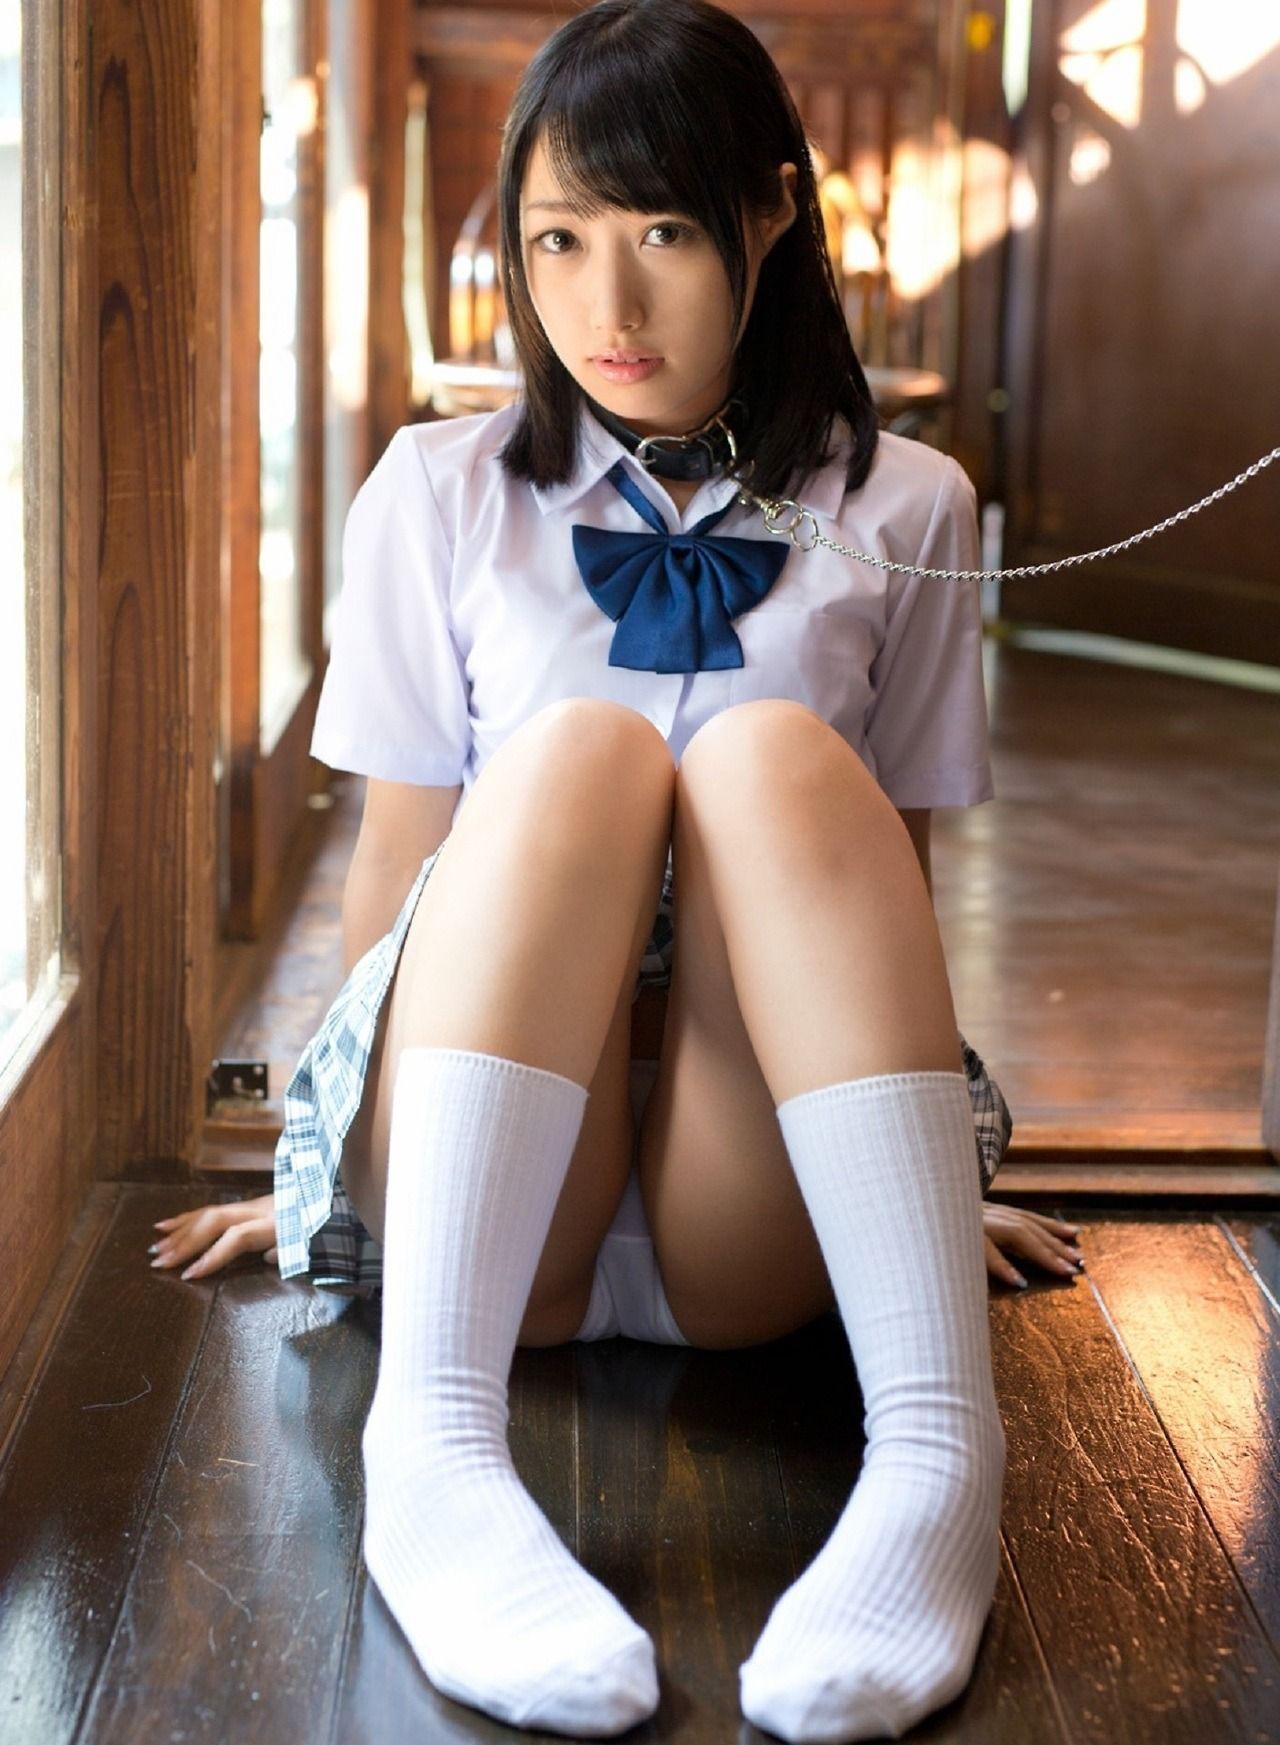 asian-amateur-japanese-schoolgirl-wet-teen-girls-pussy-nudey-selfie